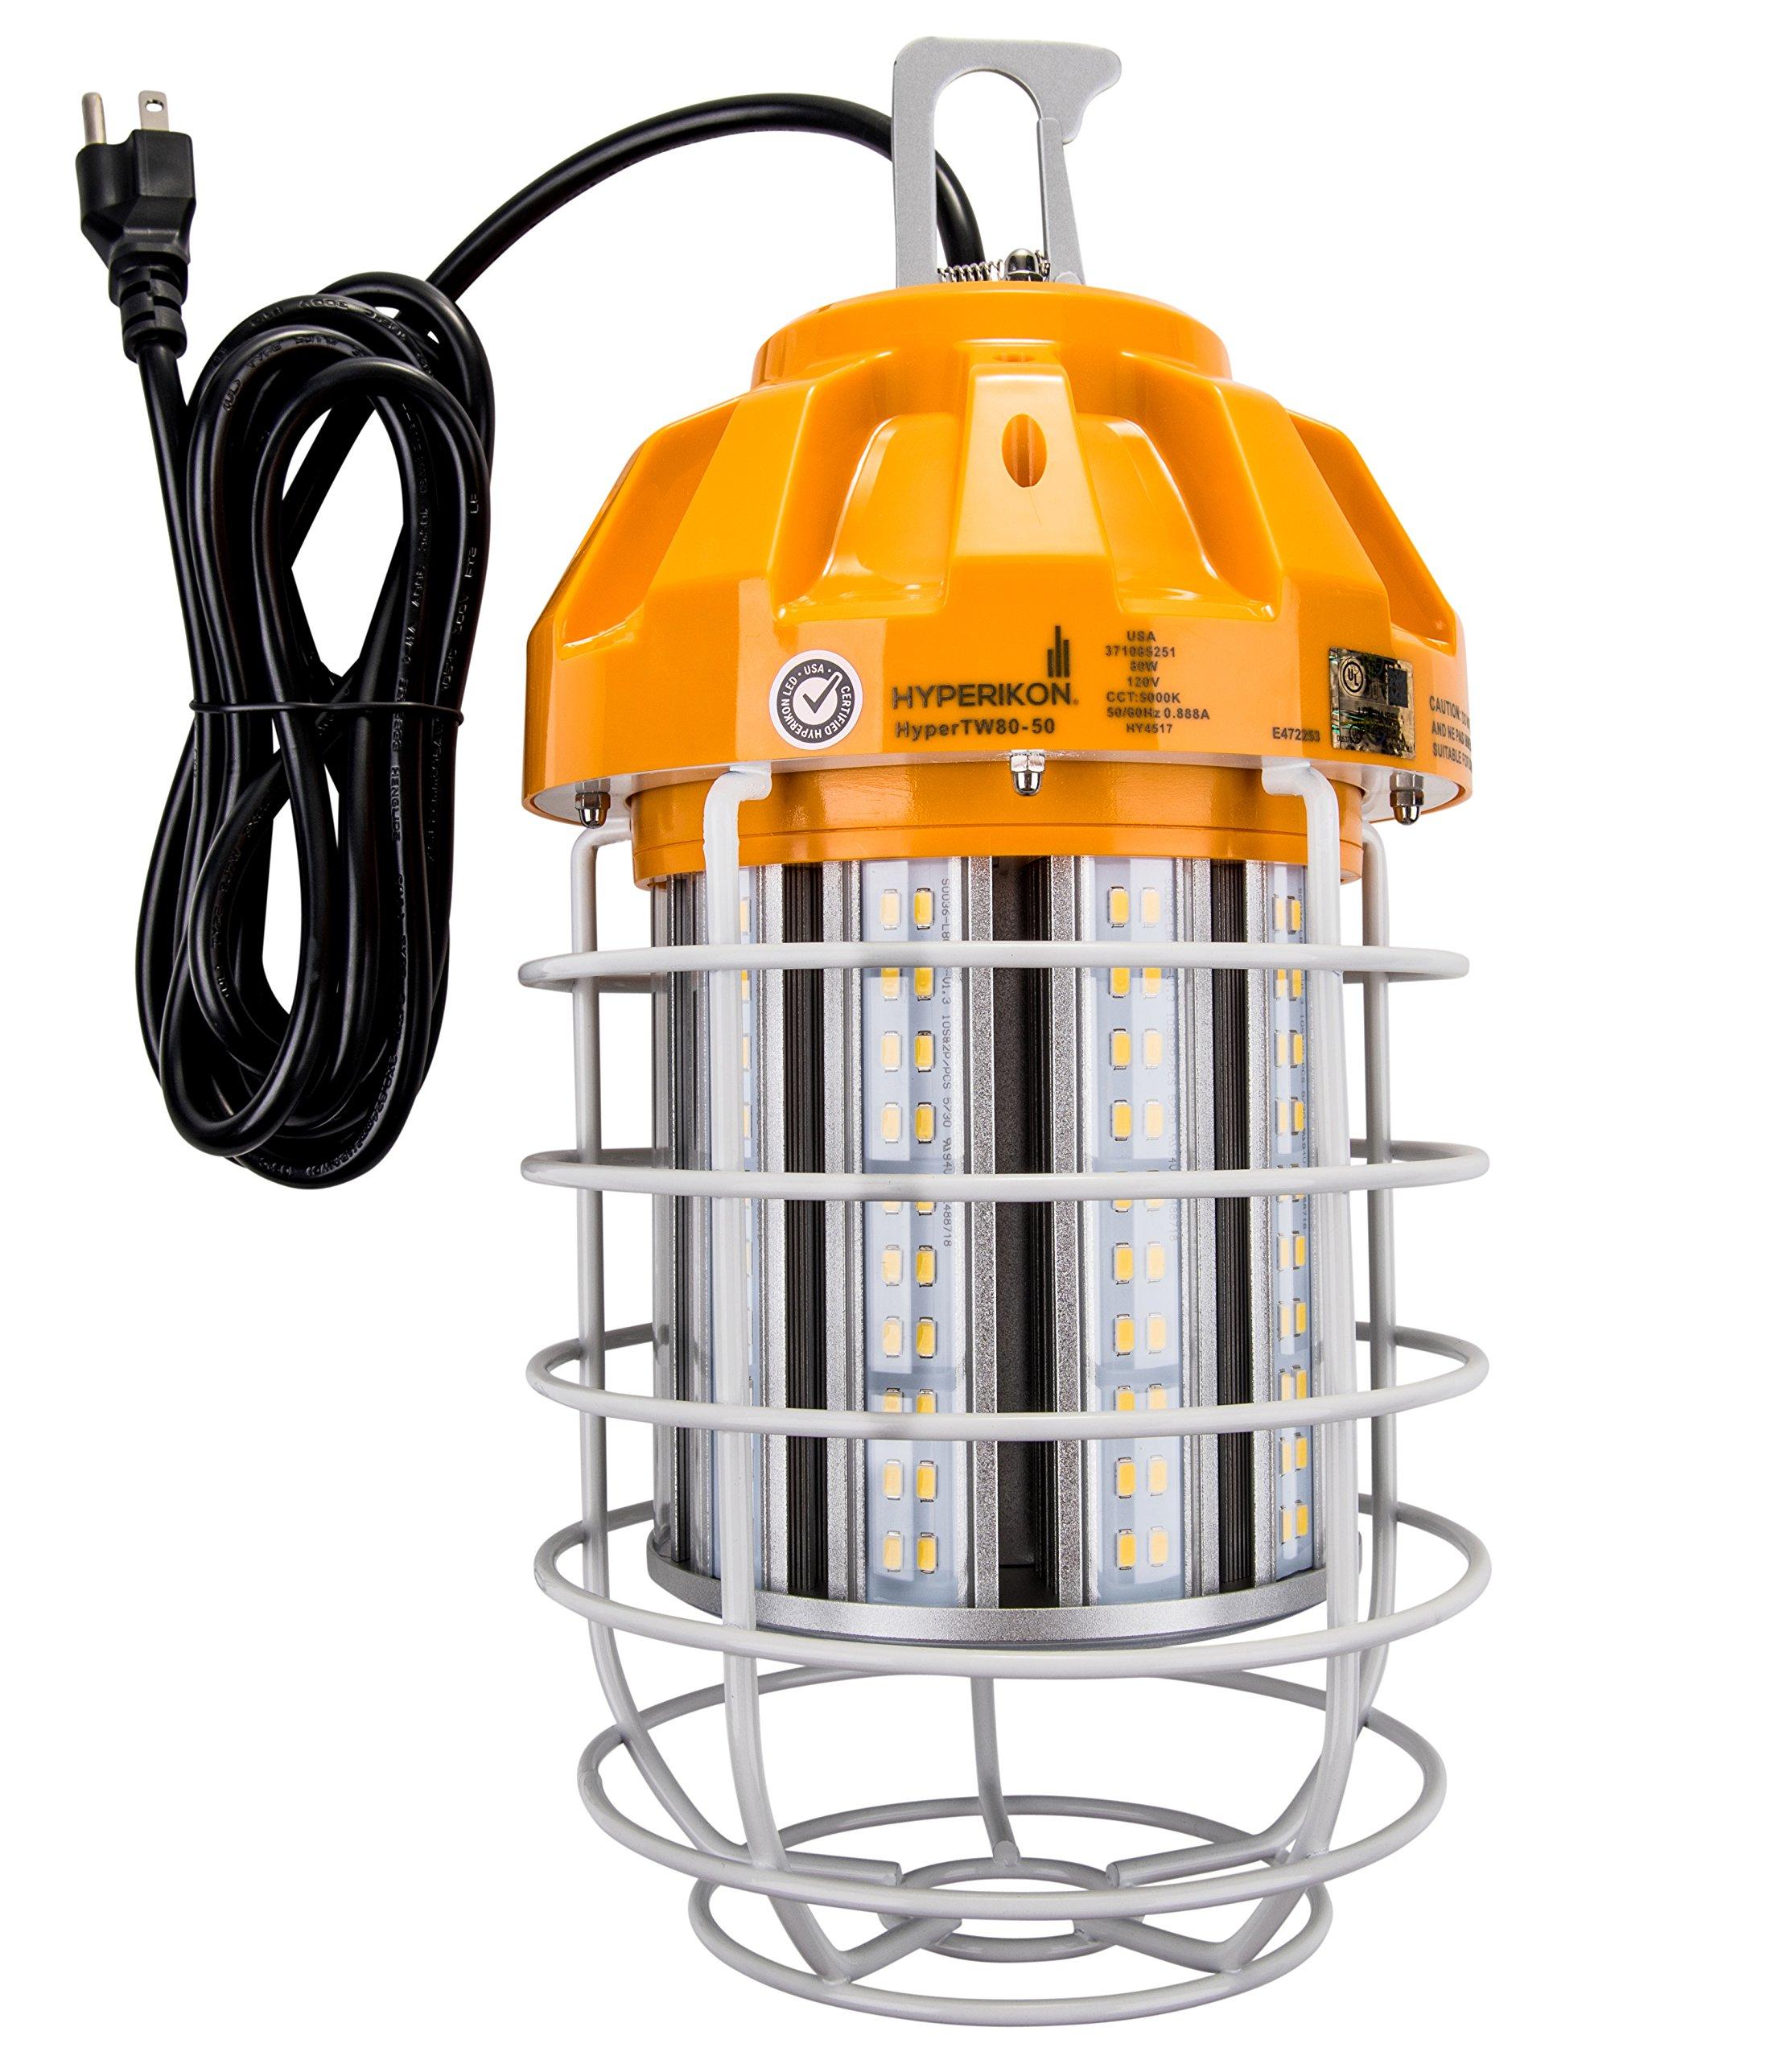 Hyperikon 80W LED Temporary Work Light Fixture, 9600 Lumens, Orange Construction Drop Light, LED High Bay Lighting, UL IP65 Waterproof, 5000K